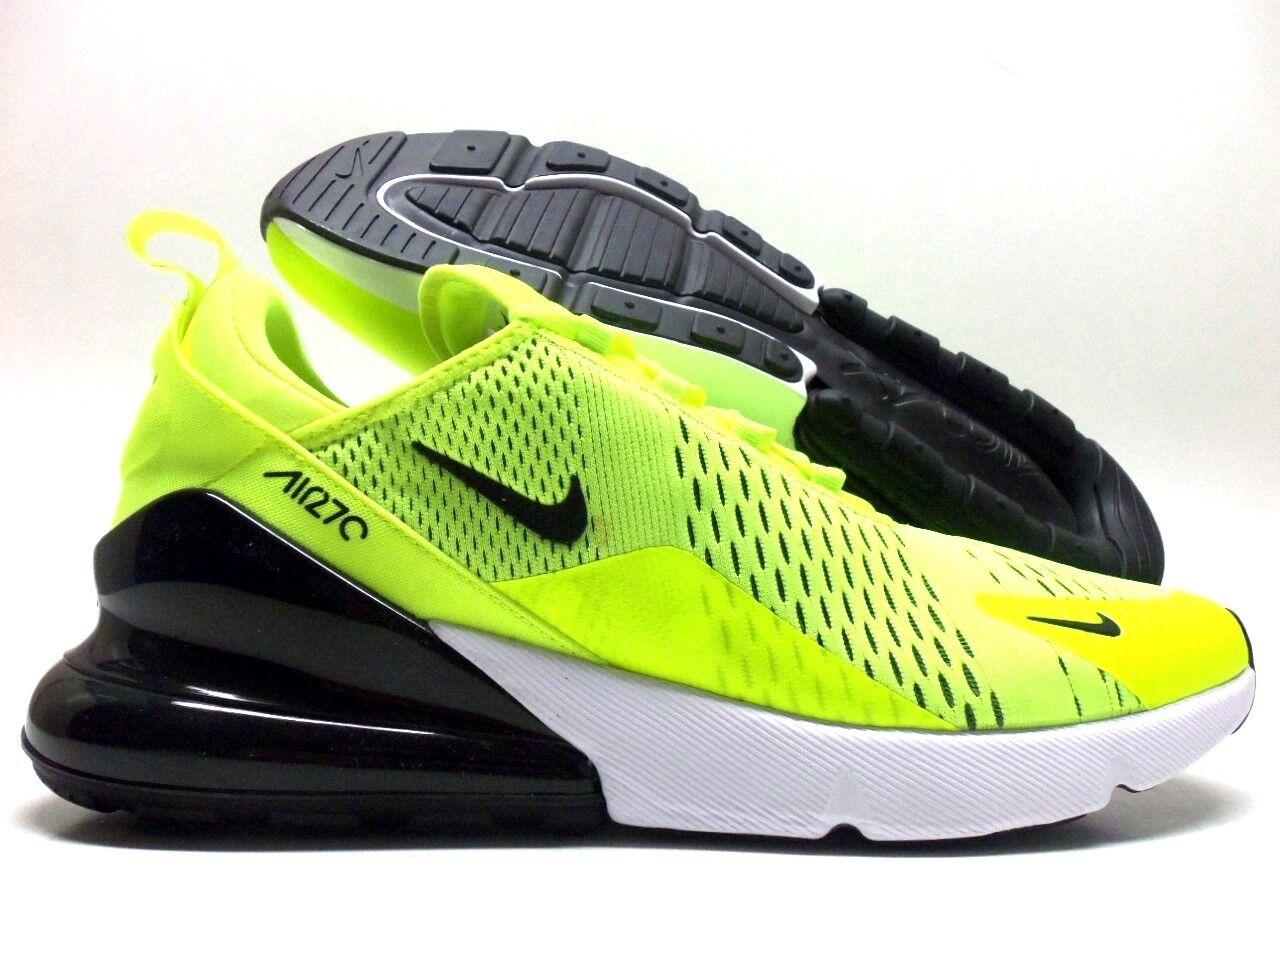 Nike air max volt 270 volt max / nero-dark grey-white dimensioni uomini 9,5 ah8050-701] 55a4f3